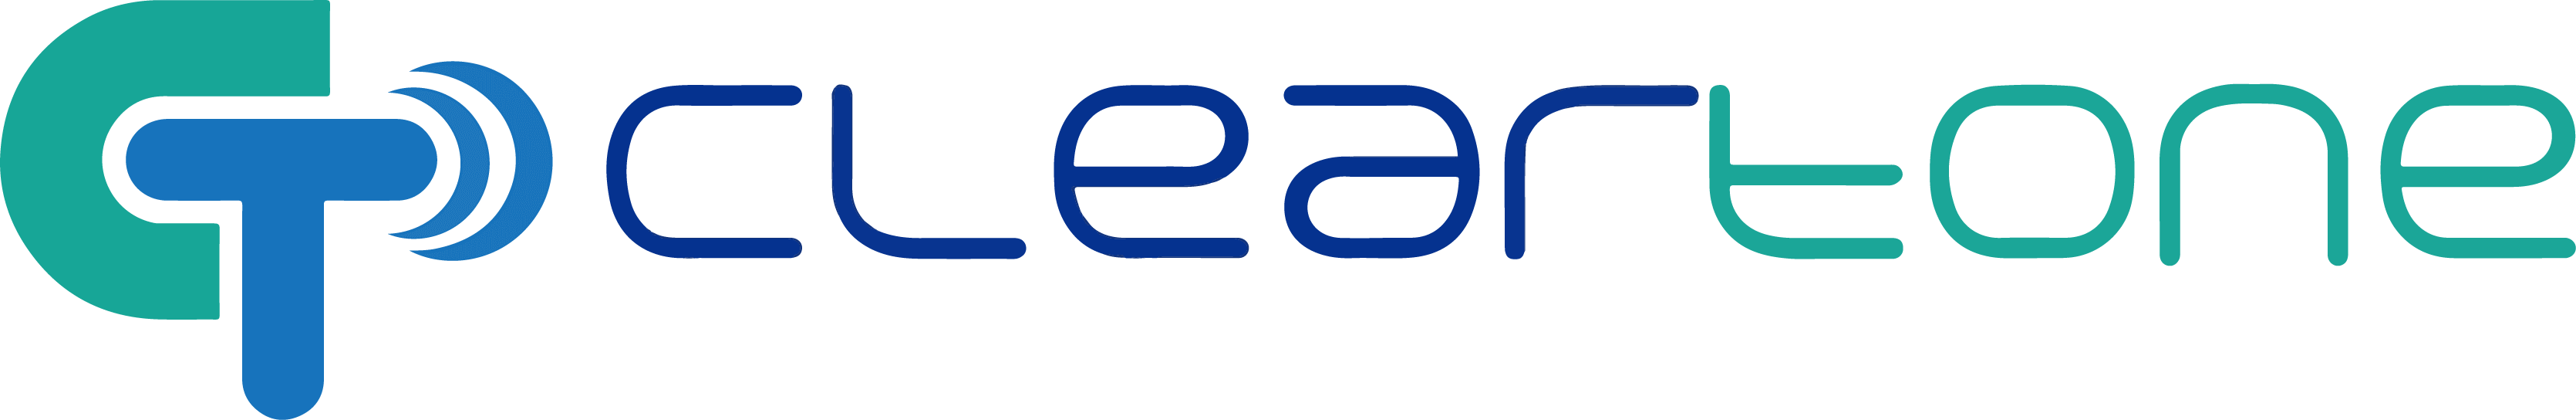 Barclays business bank account logo